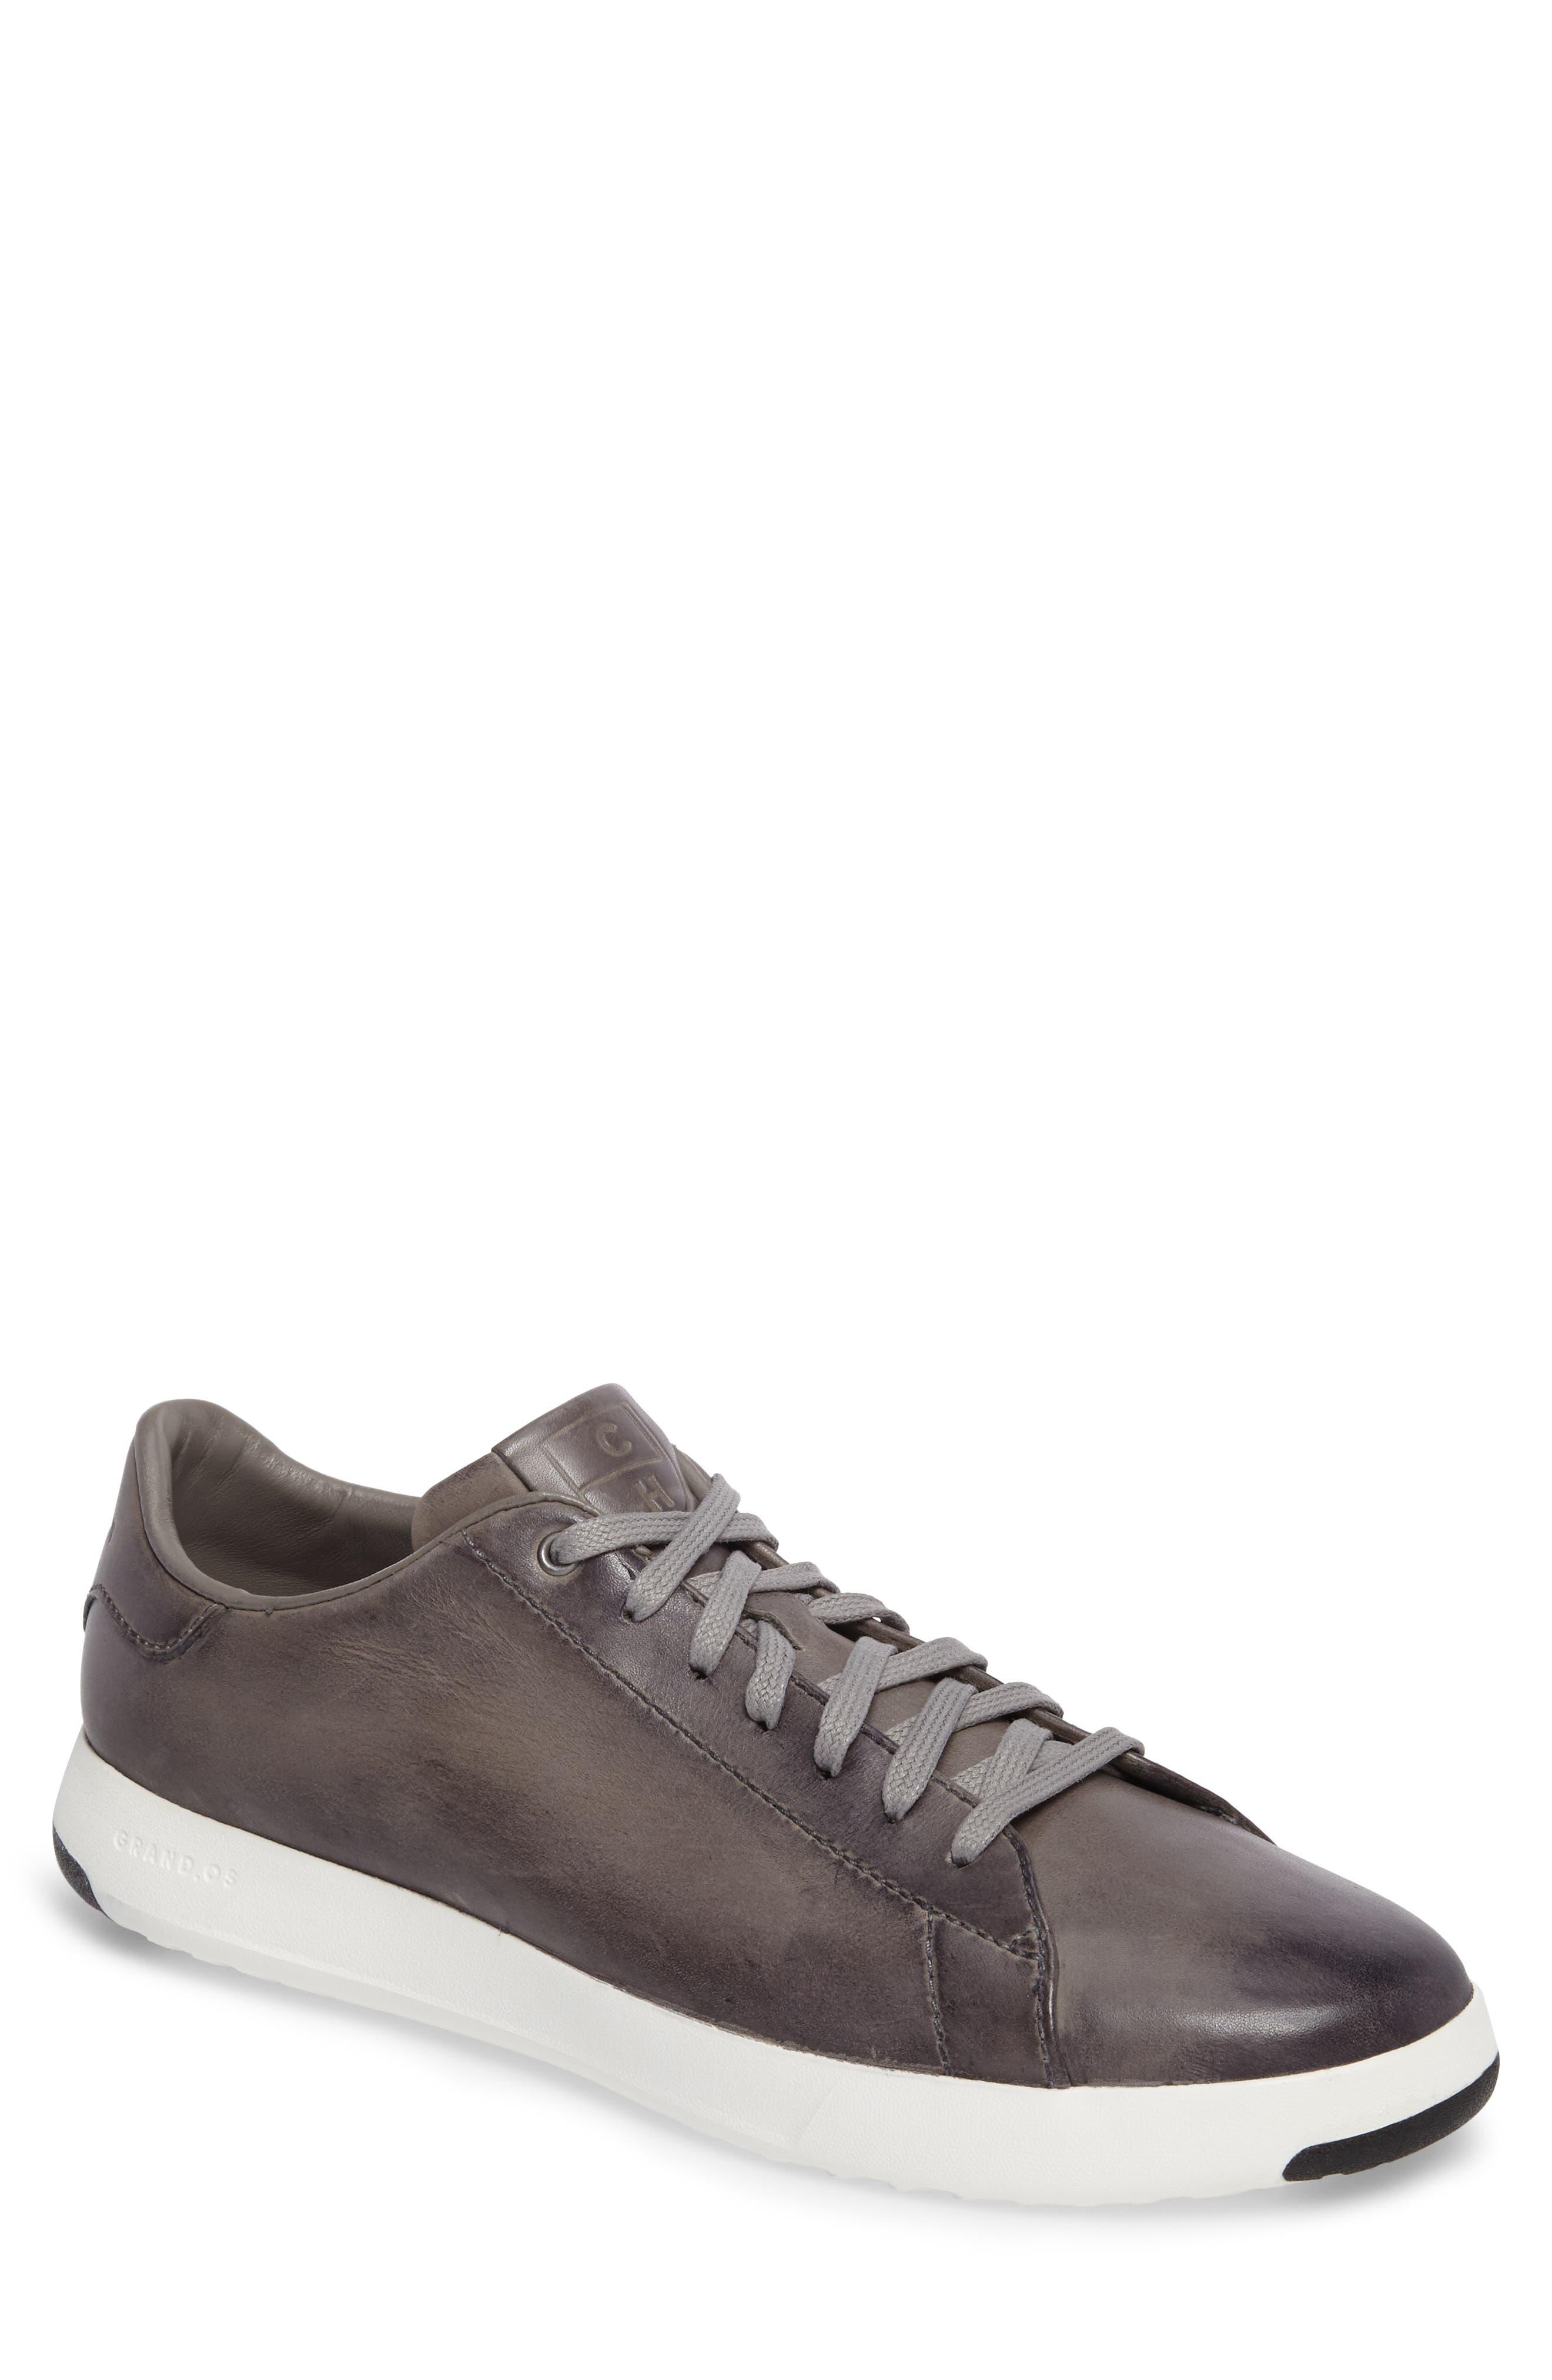 GrandPro Tennis Sneaker,                             Main thumbnail 1, color,                             IRONSTONE GRAY HANDSTAIN